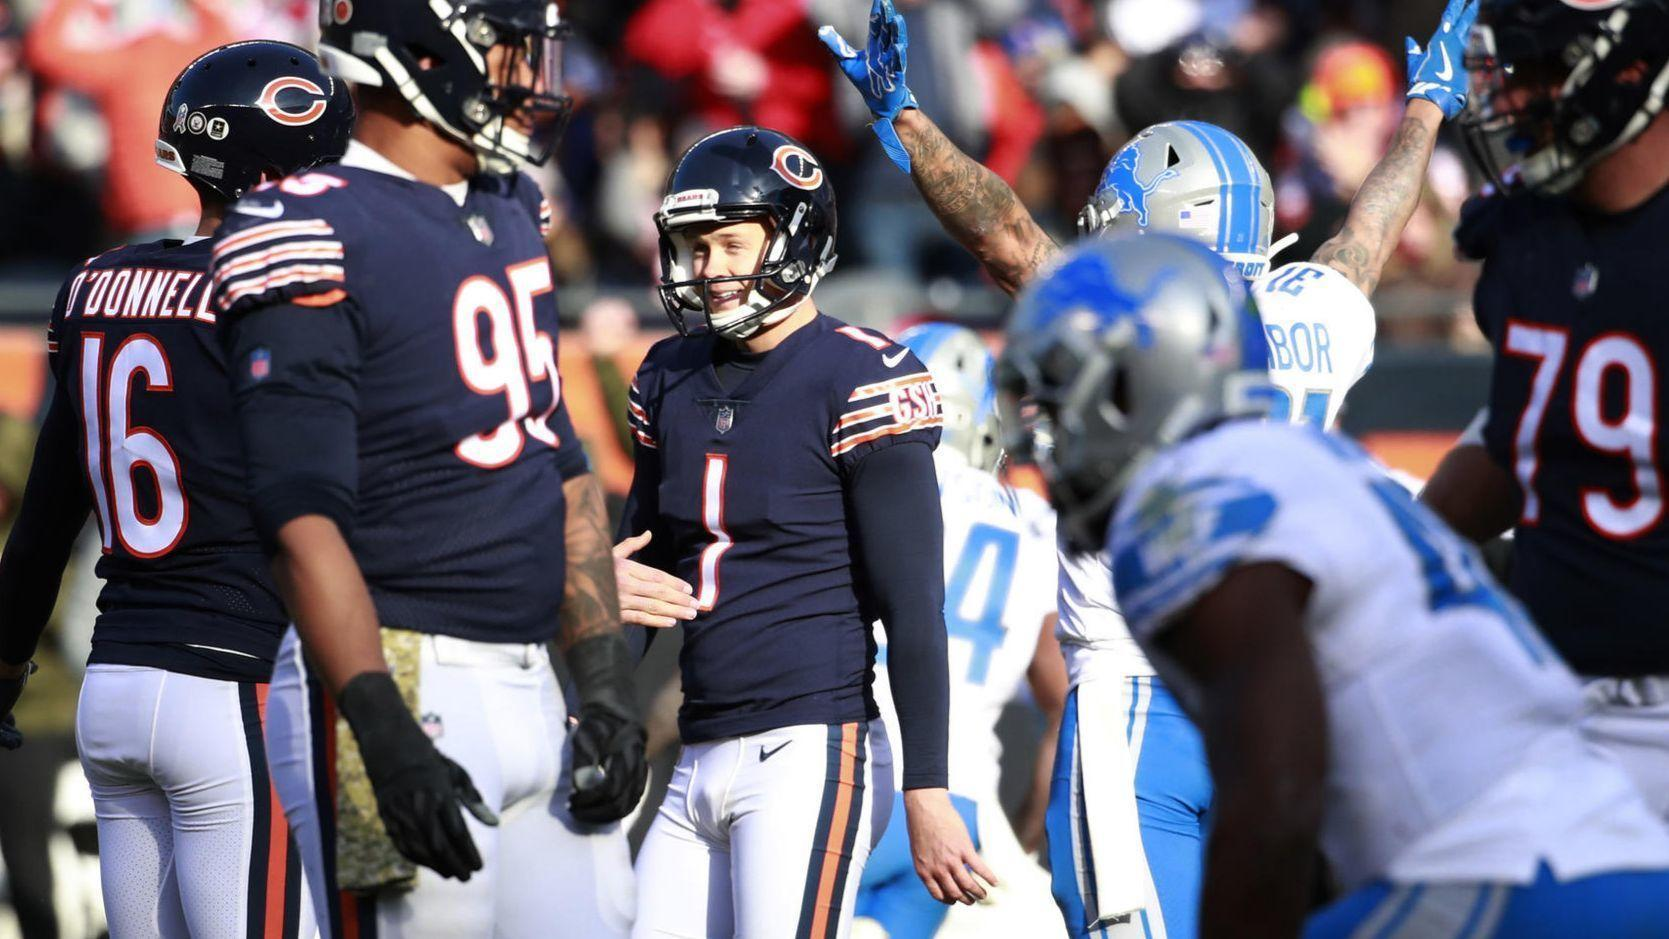 80de0b331a4 'It can't hurt.' Bears kicker Cody Parkey practices at Soldier Field tonight